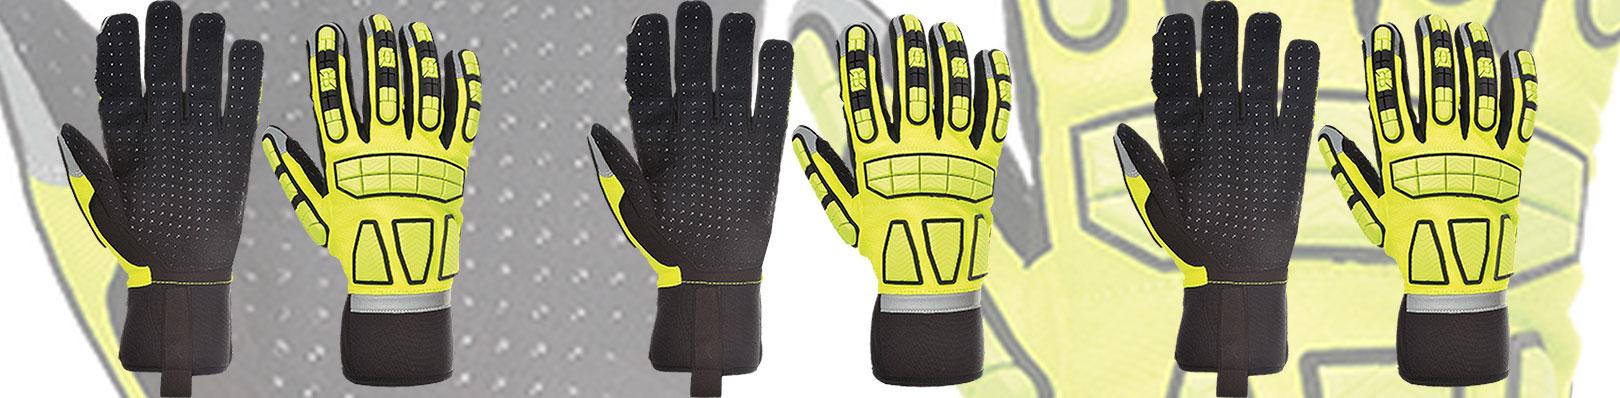 Gloves Terminology, Gloves Terminology, cn work safety supplies, cn work safety supplies